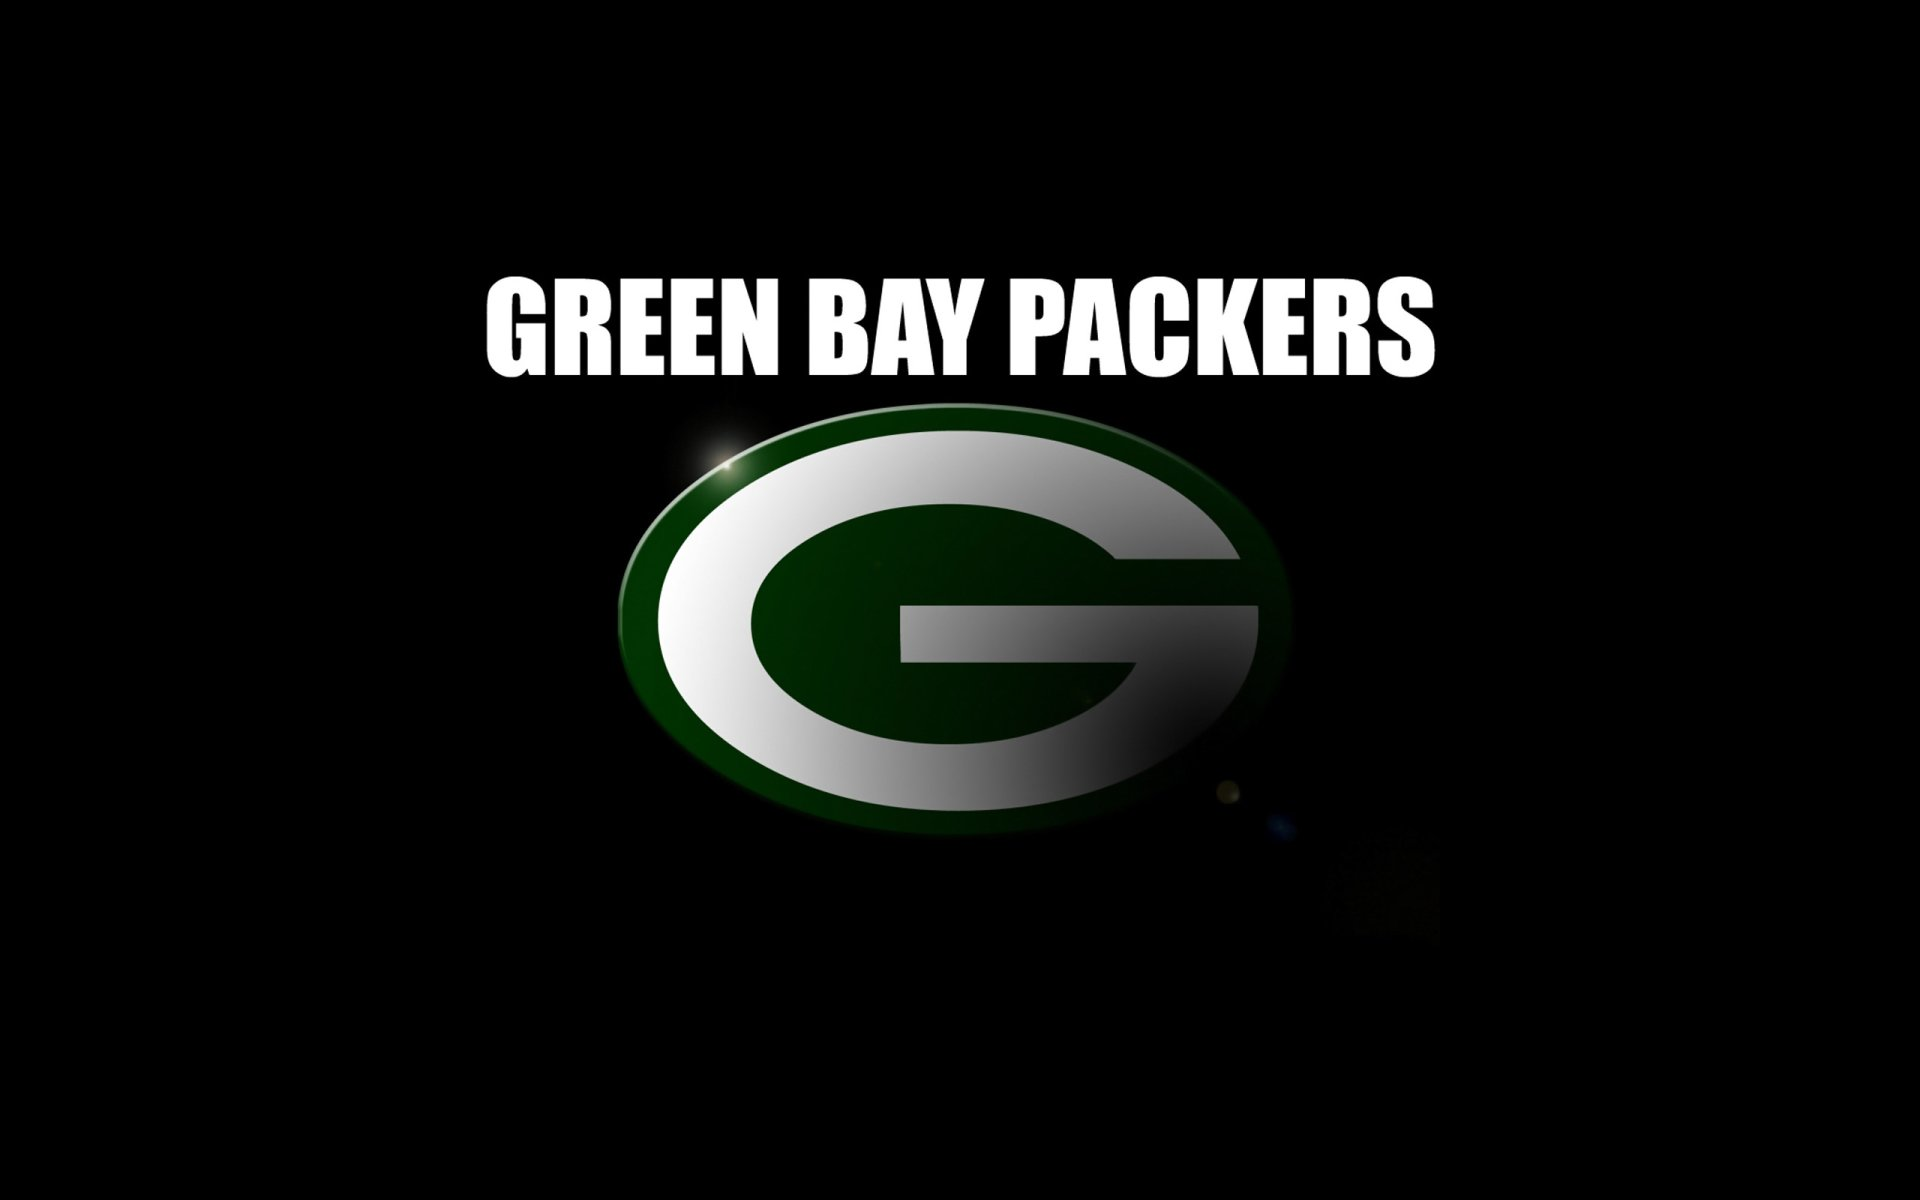 Green Bay Packers HD Wallpaper